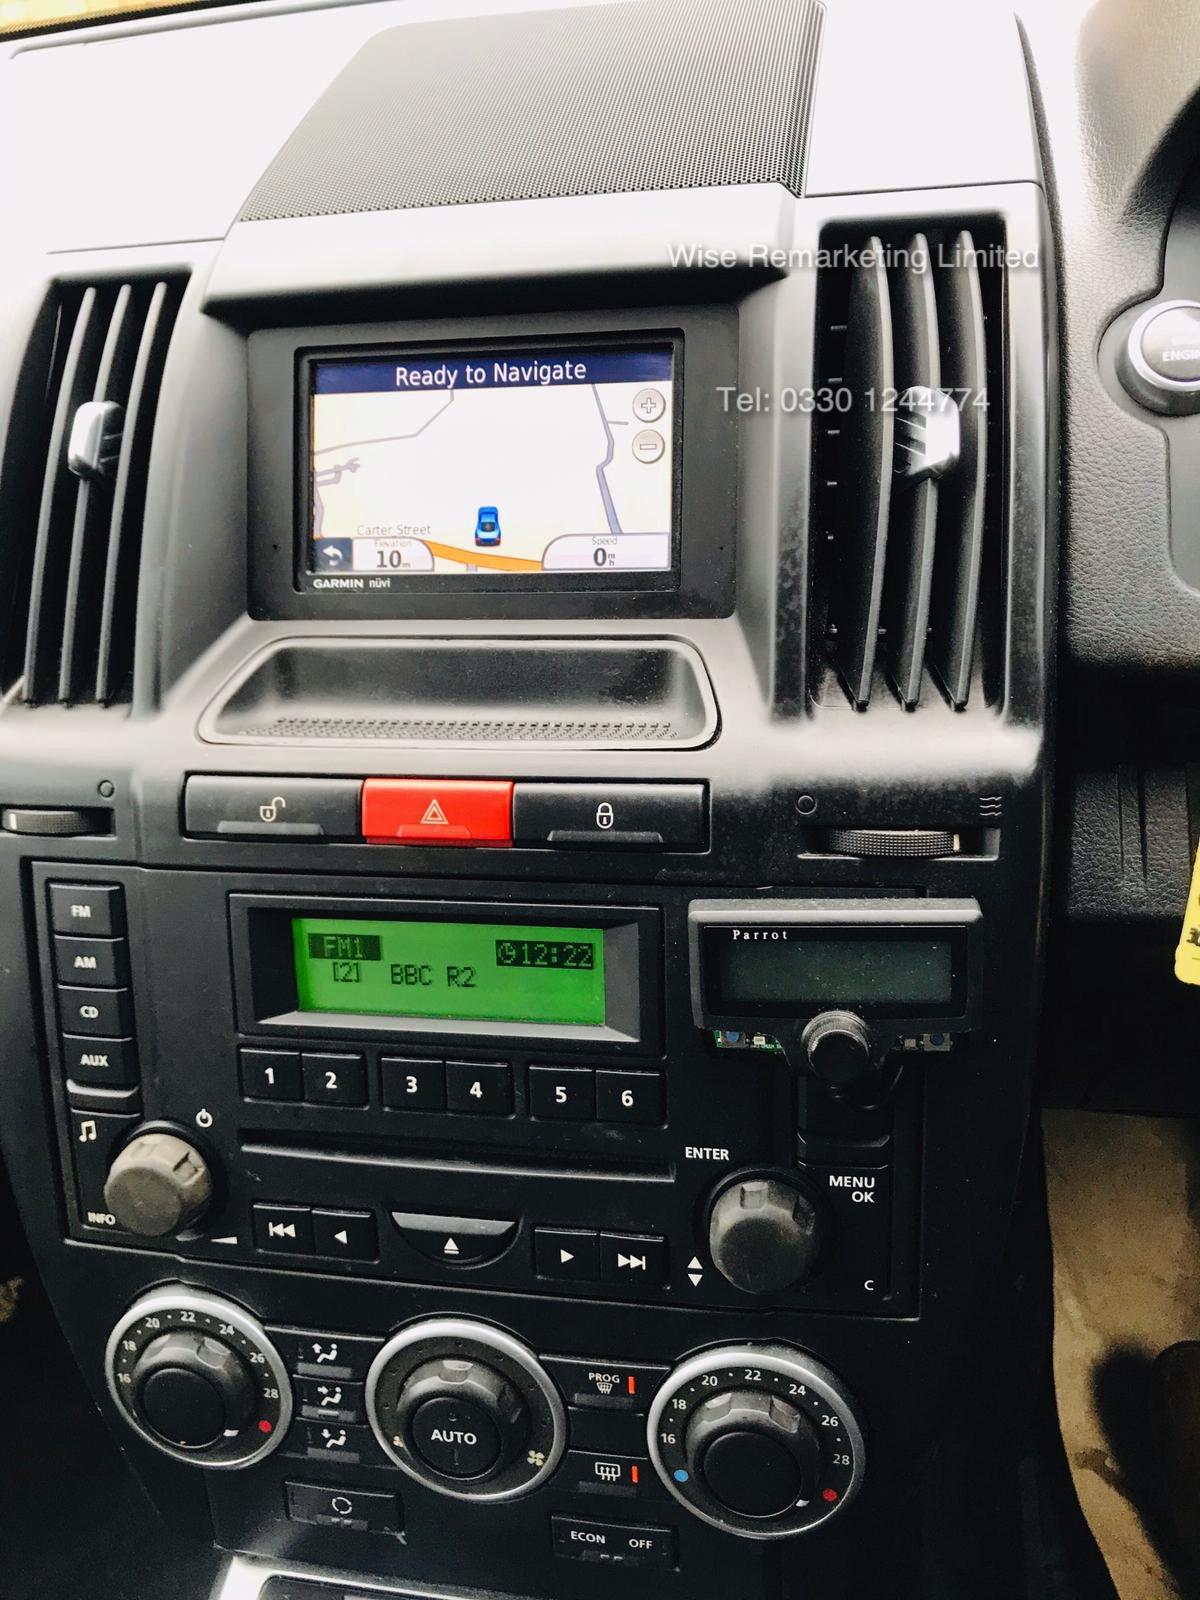 (RESERVE MET)Land Rover Freelander GS 2.2 TD4 Auto - 2009 09 Reg - Service History - Sat Nav - Image 19 of 27